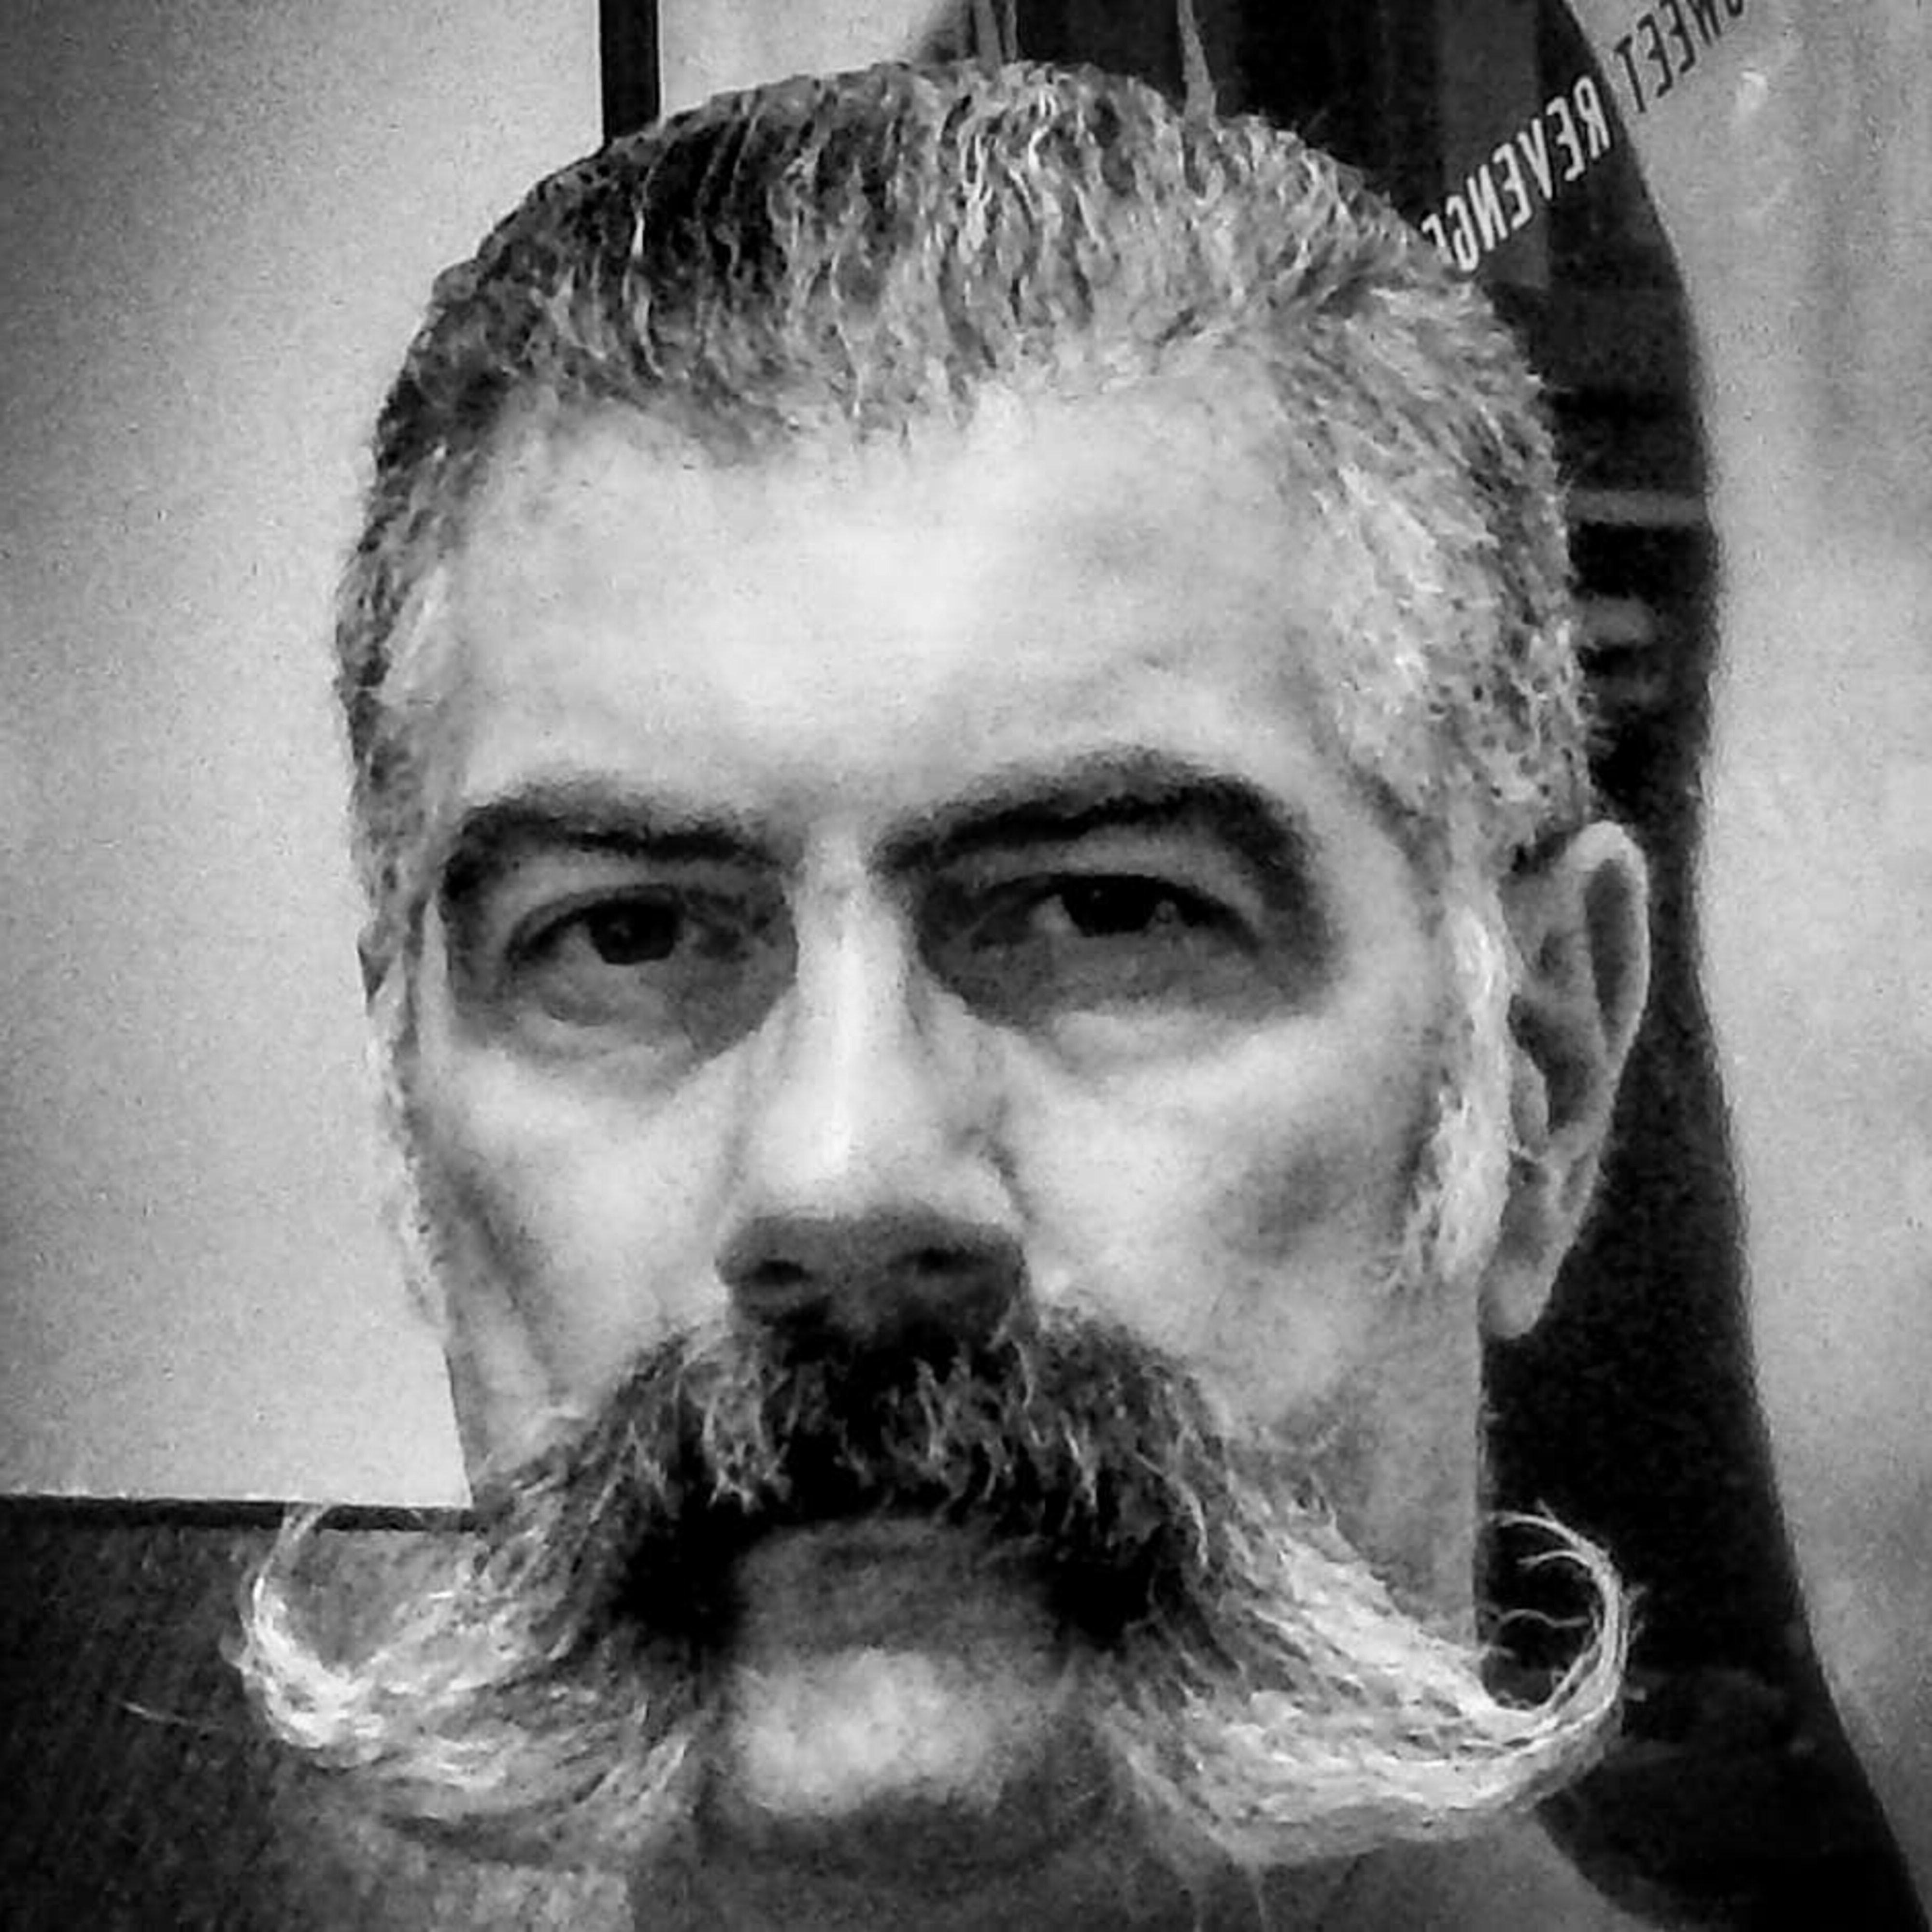 Handlebar mustache of 70s.